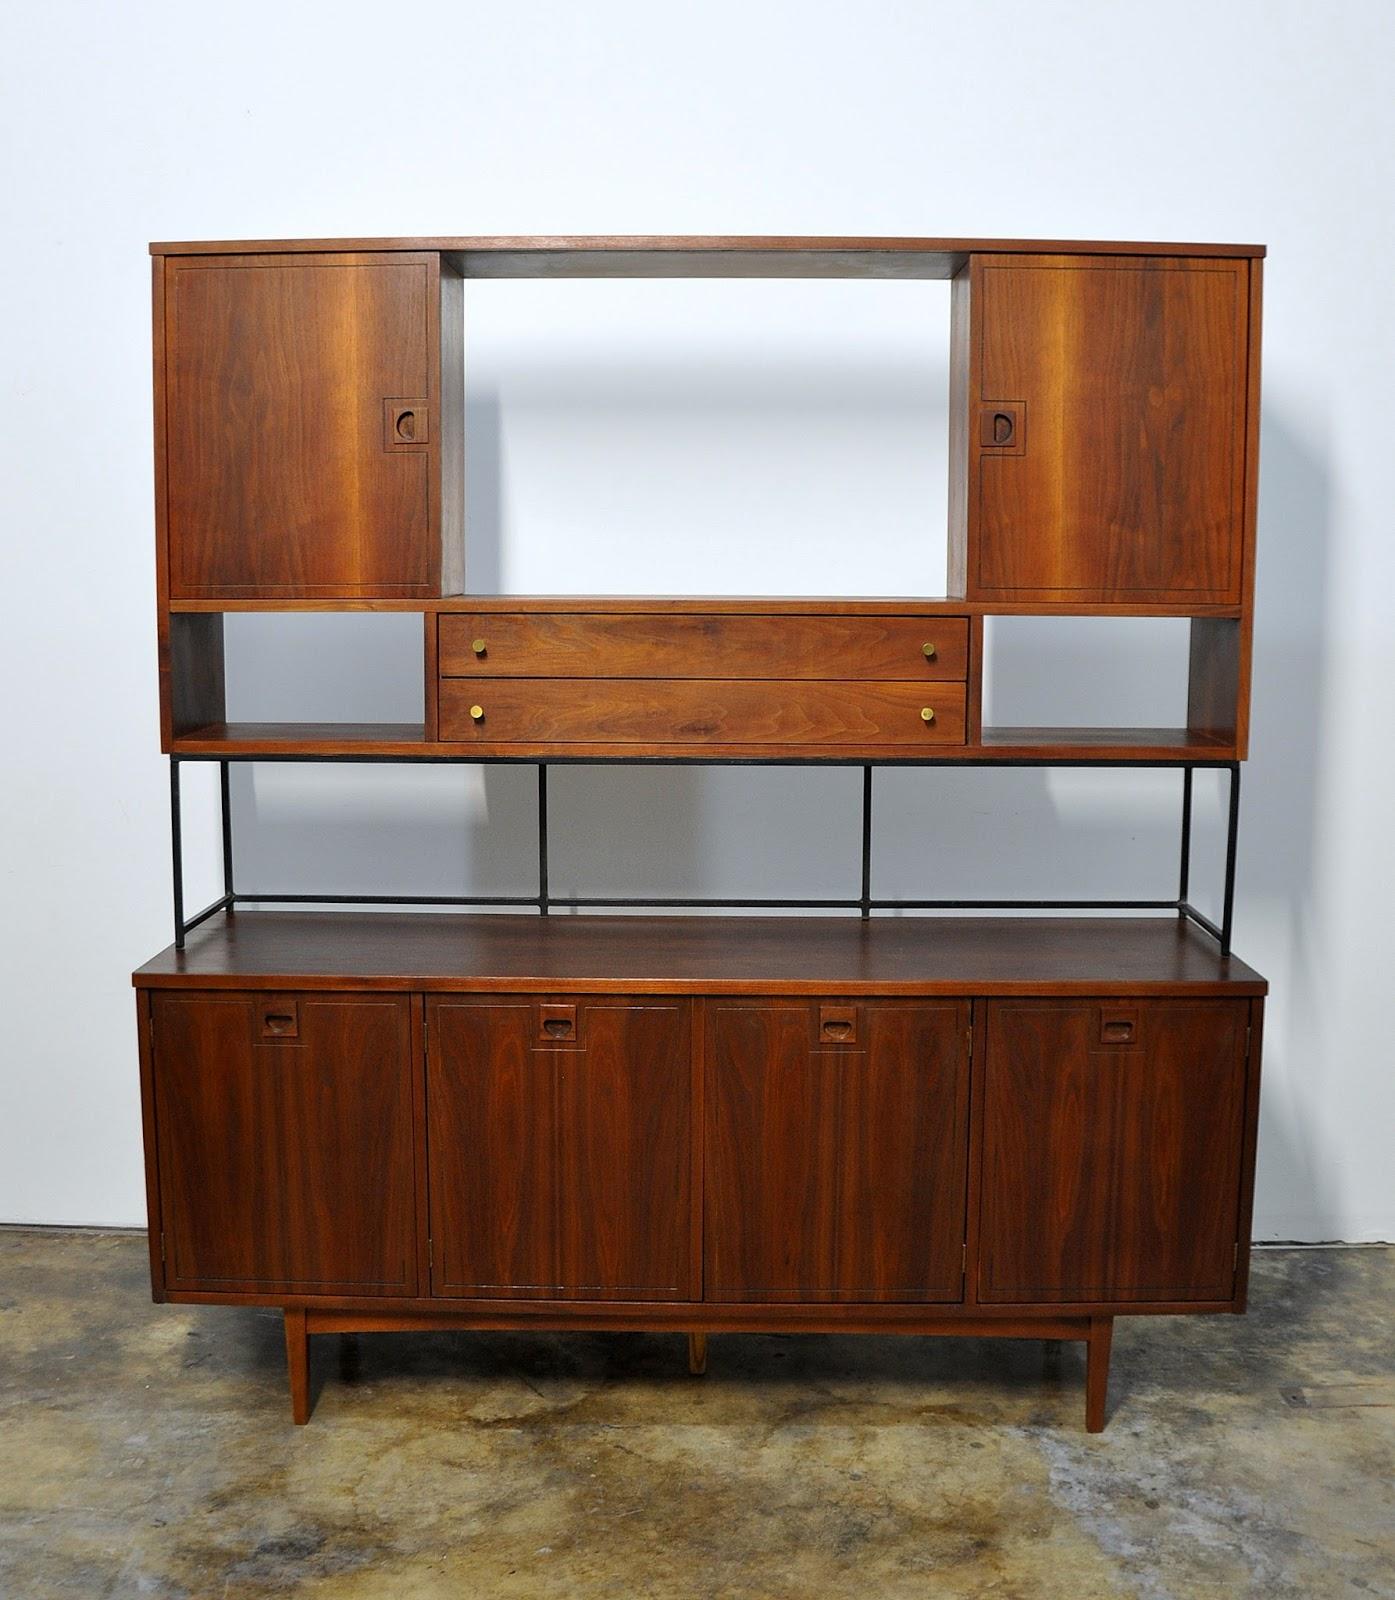 Select Modern Stanley Furniture Credenza Bar Room Divider Media Console Buffet Or Sideboard